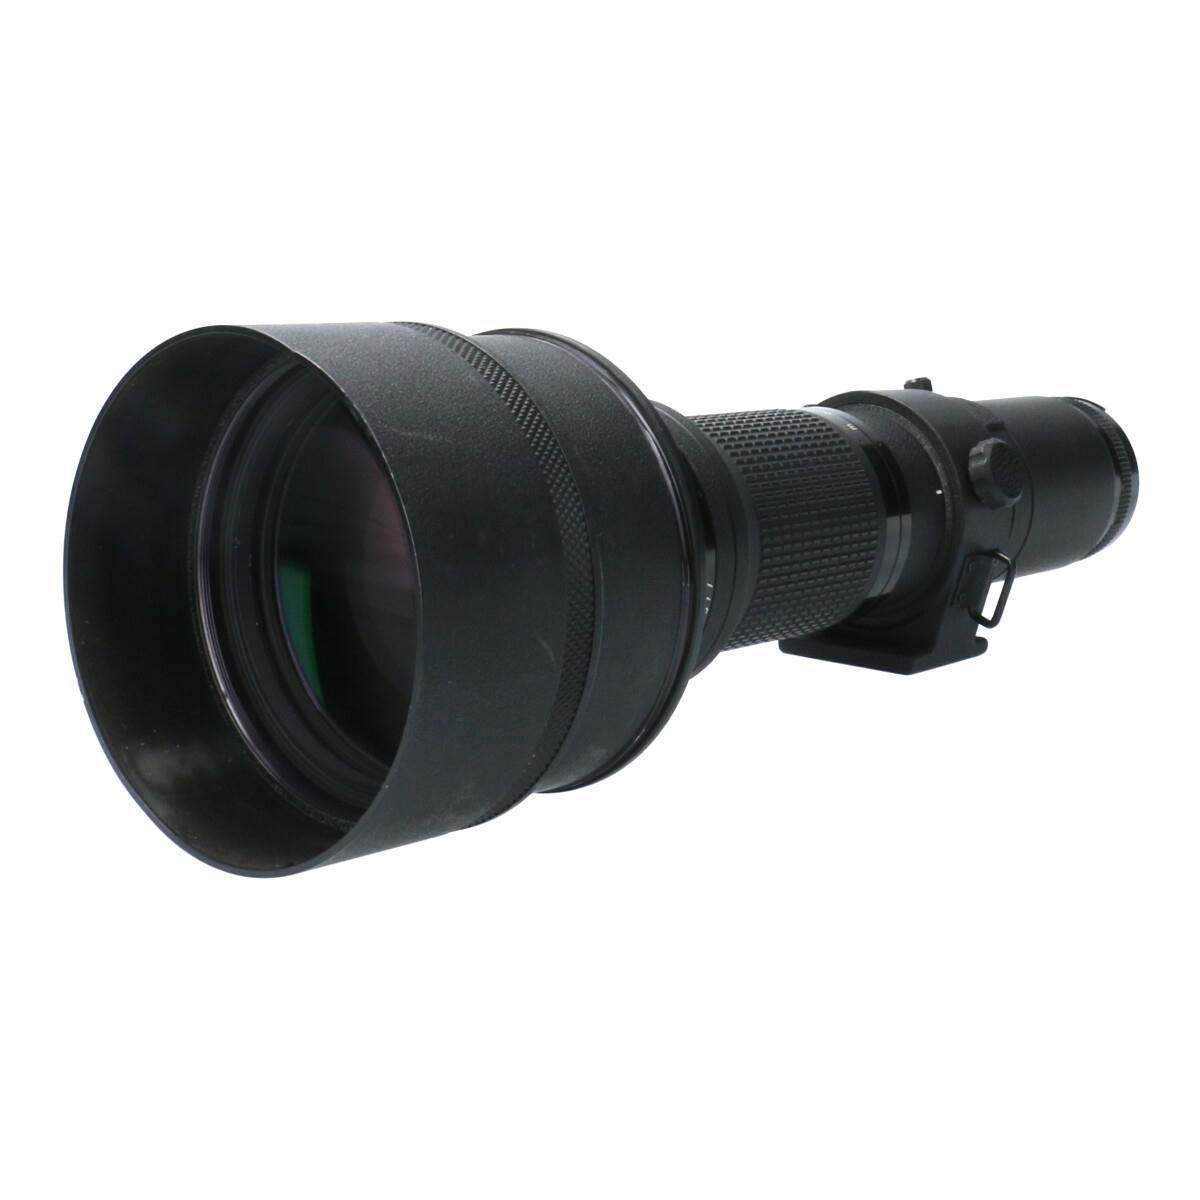 【MORESALE】NIKON AI600mm F5.6S ED